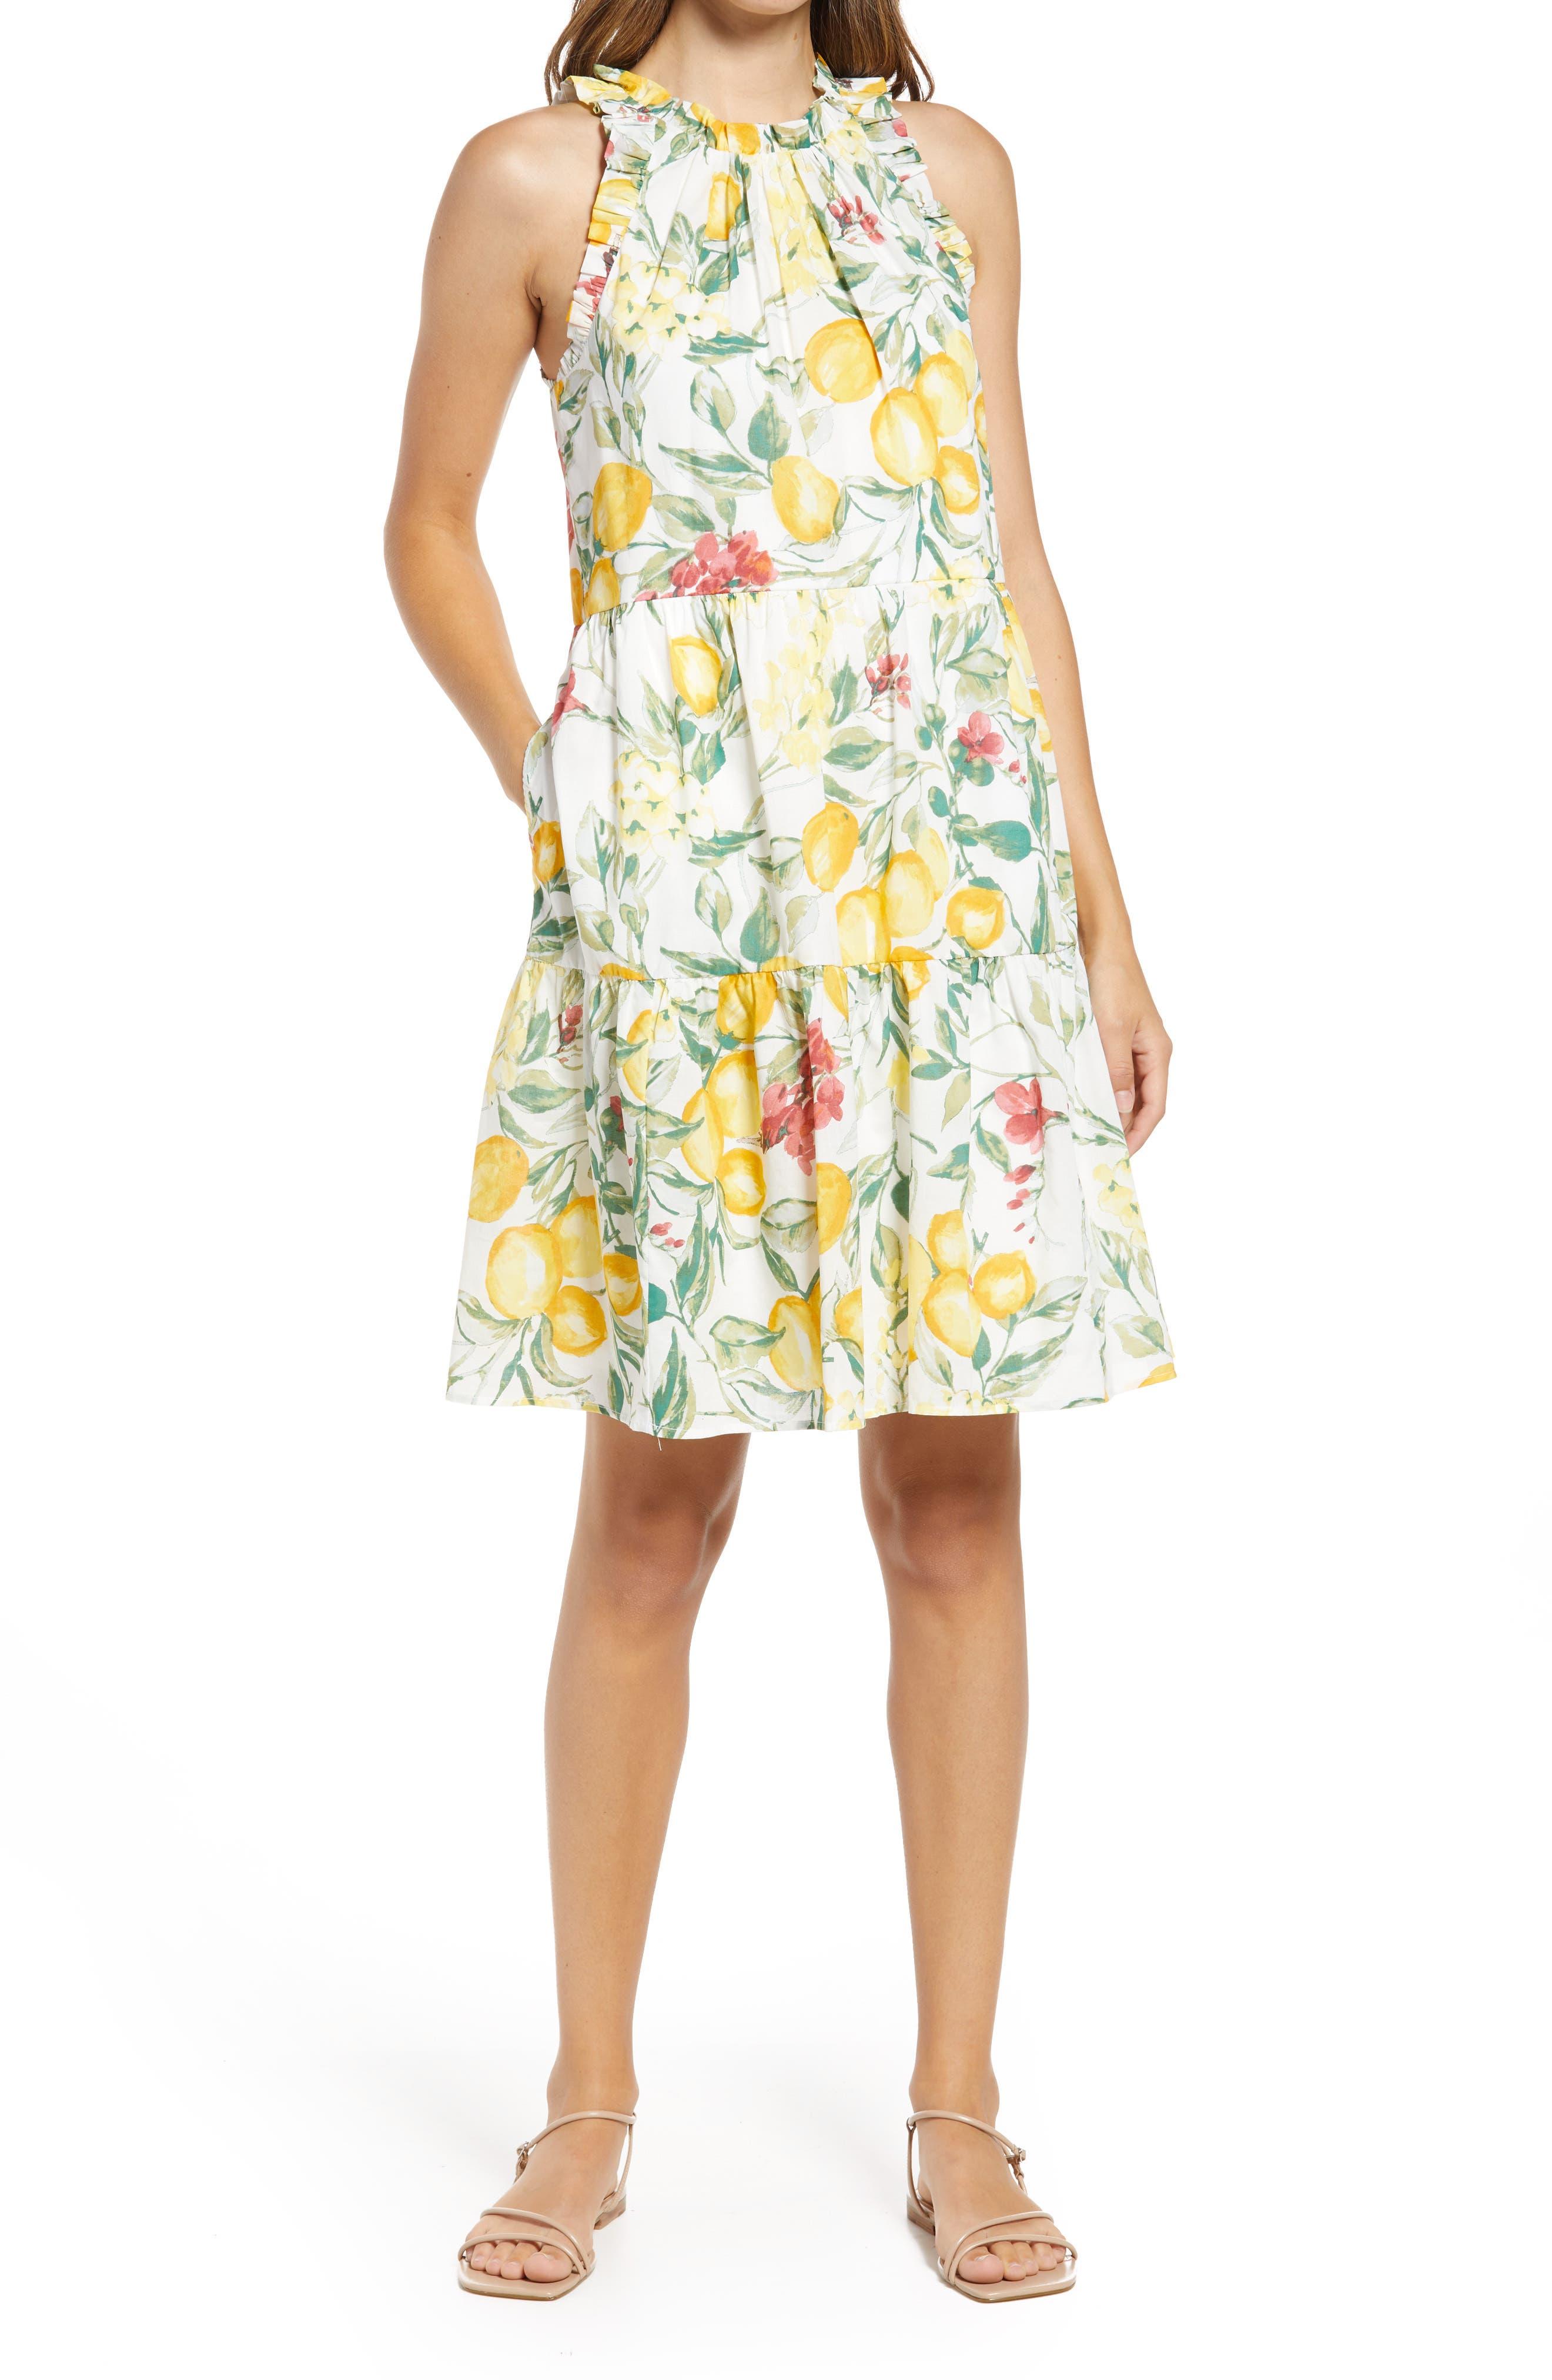 Lemon Print Cotton Sundress